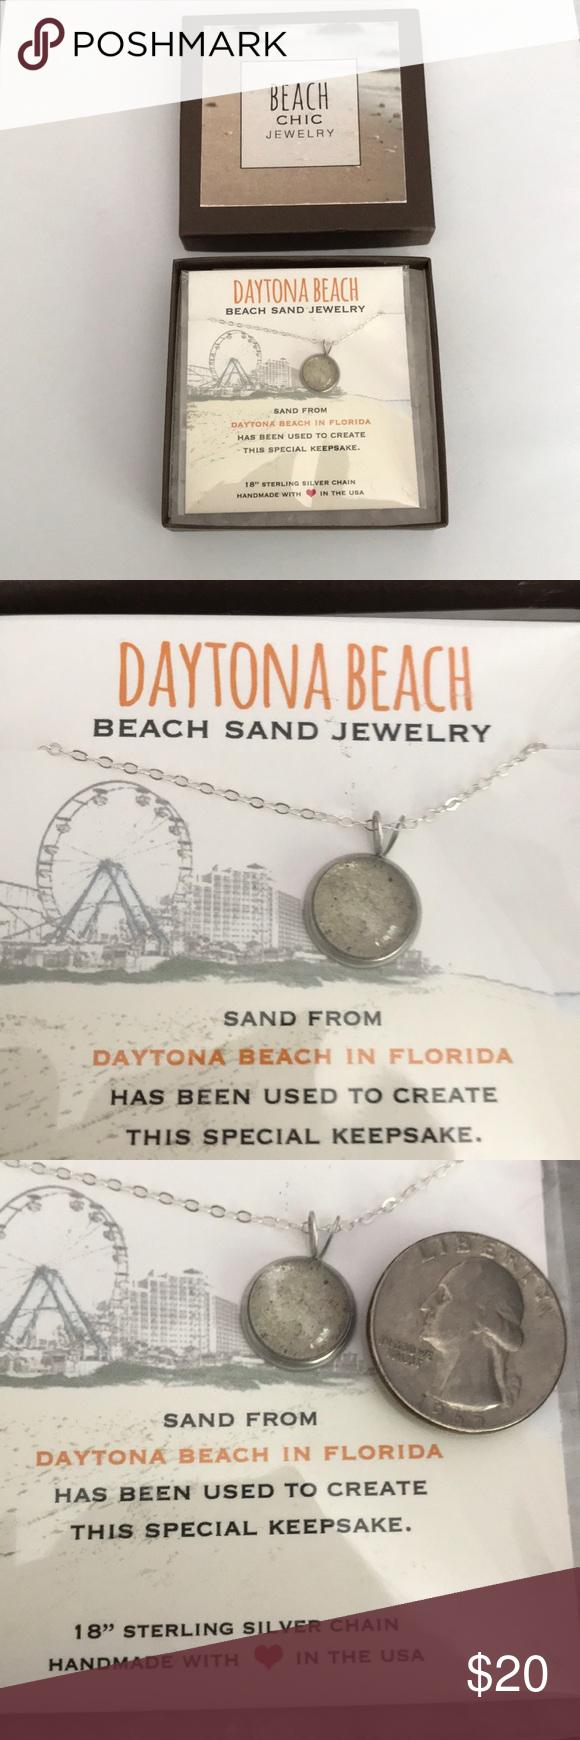 28+ Jewelry stores daytona beach florida viral